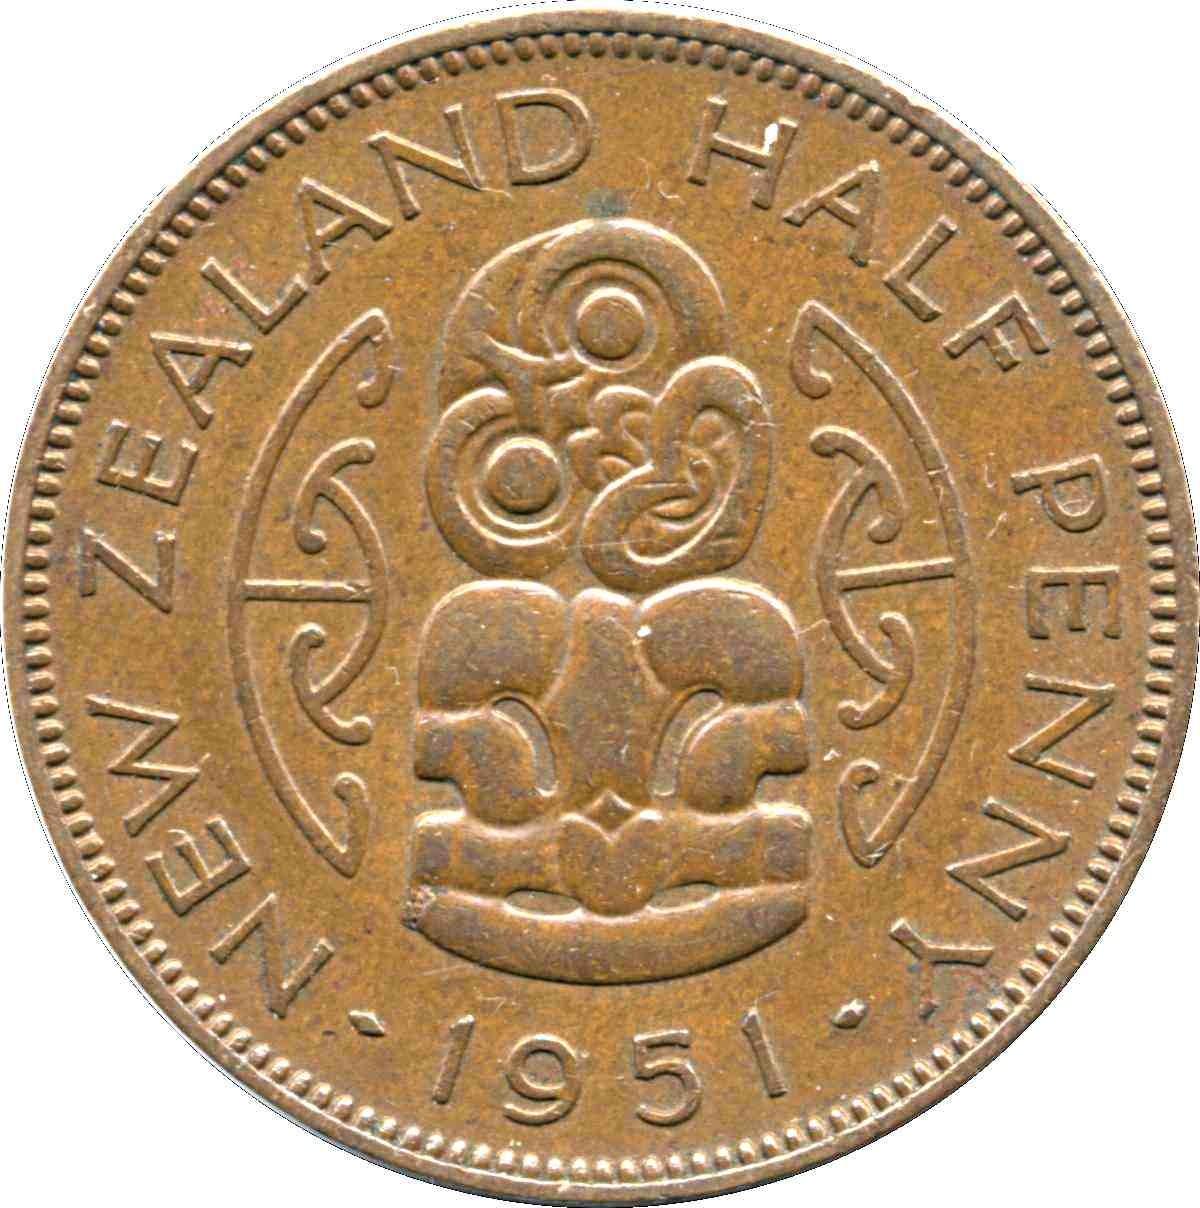 New Zealand ½ Penny (1949-1952 George VI)